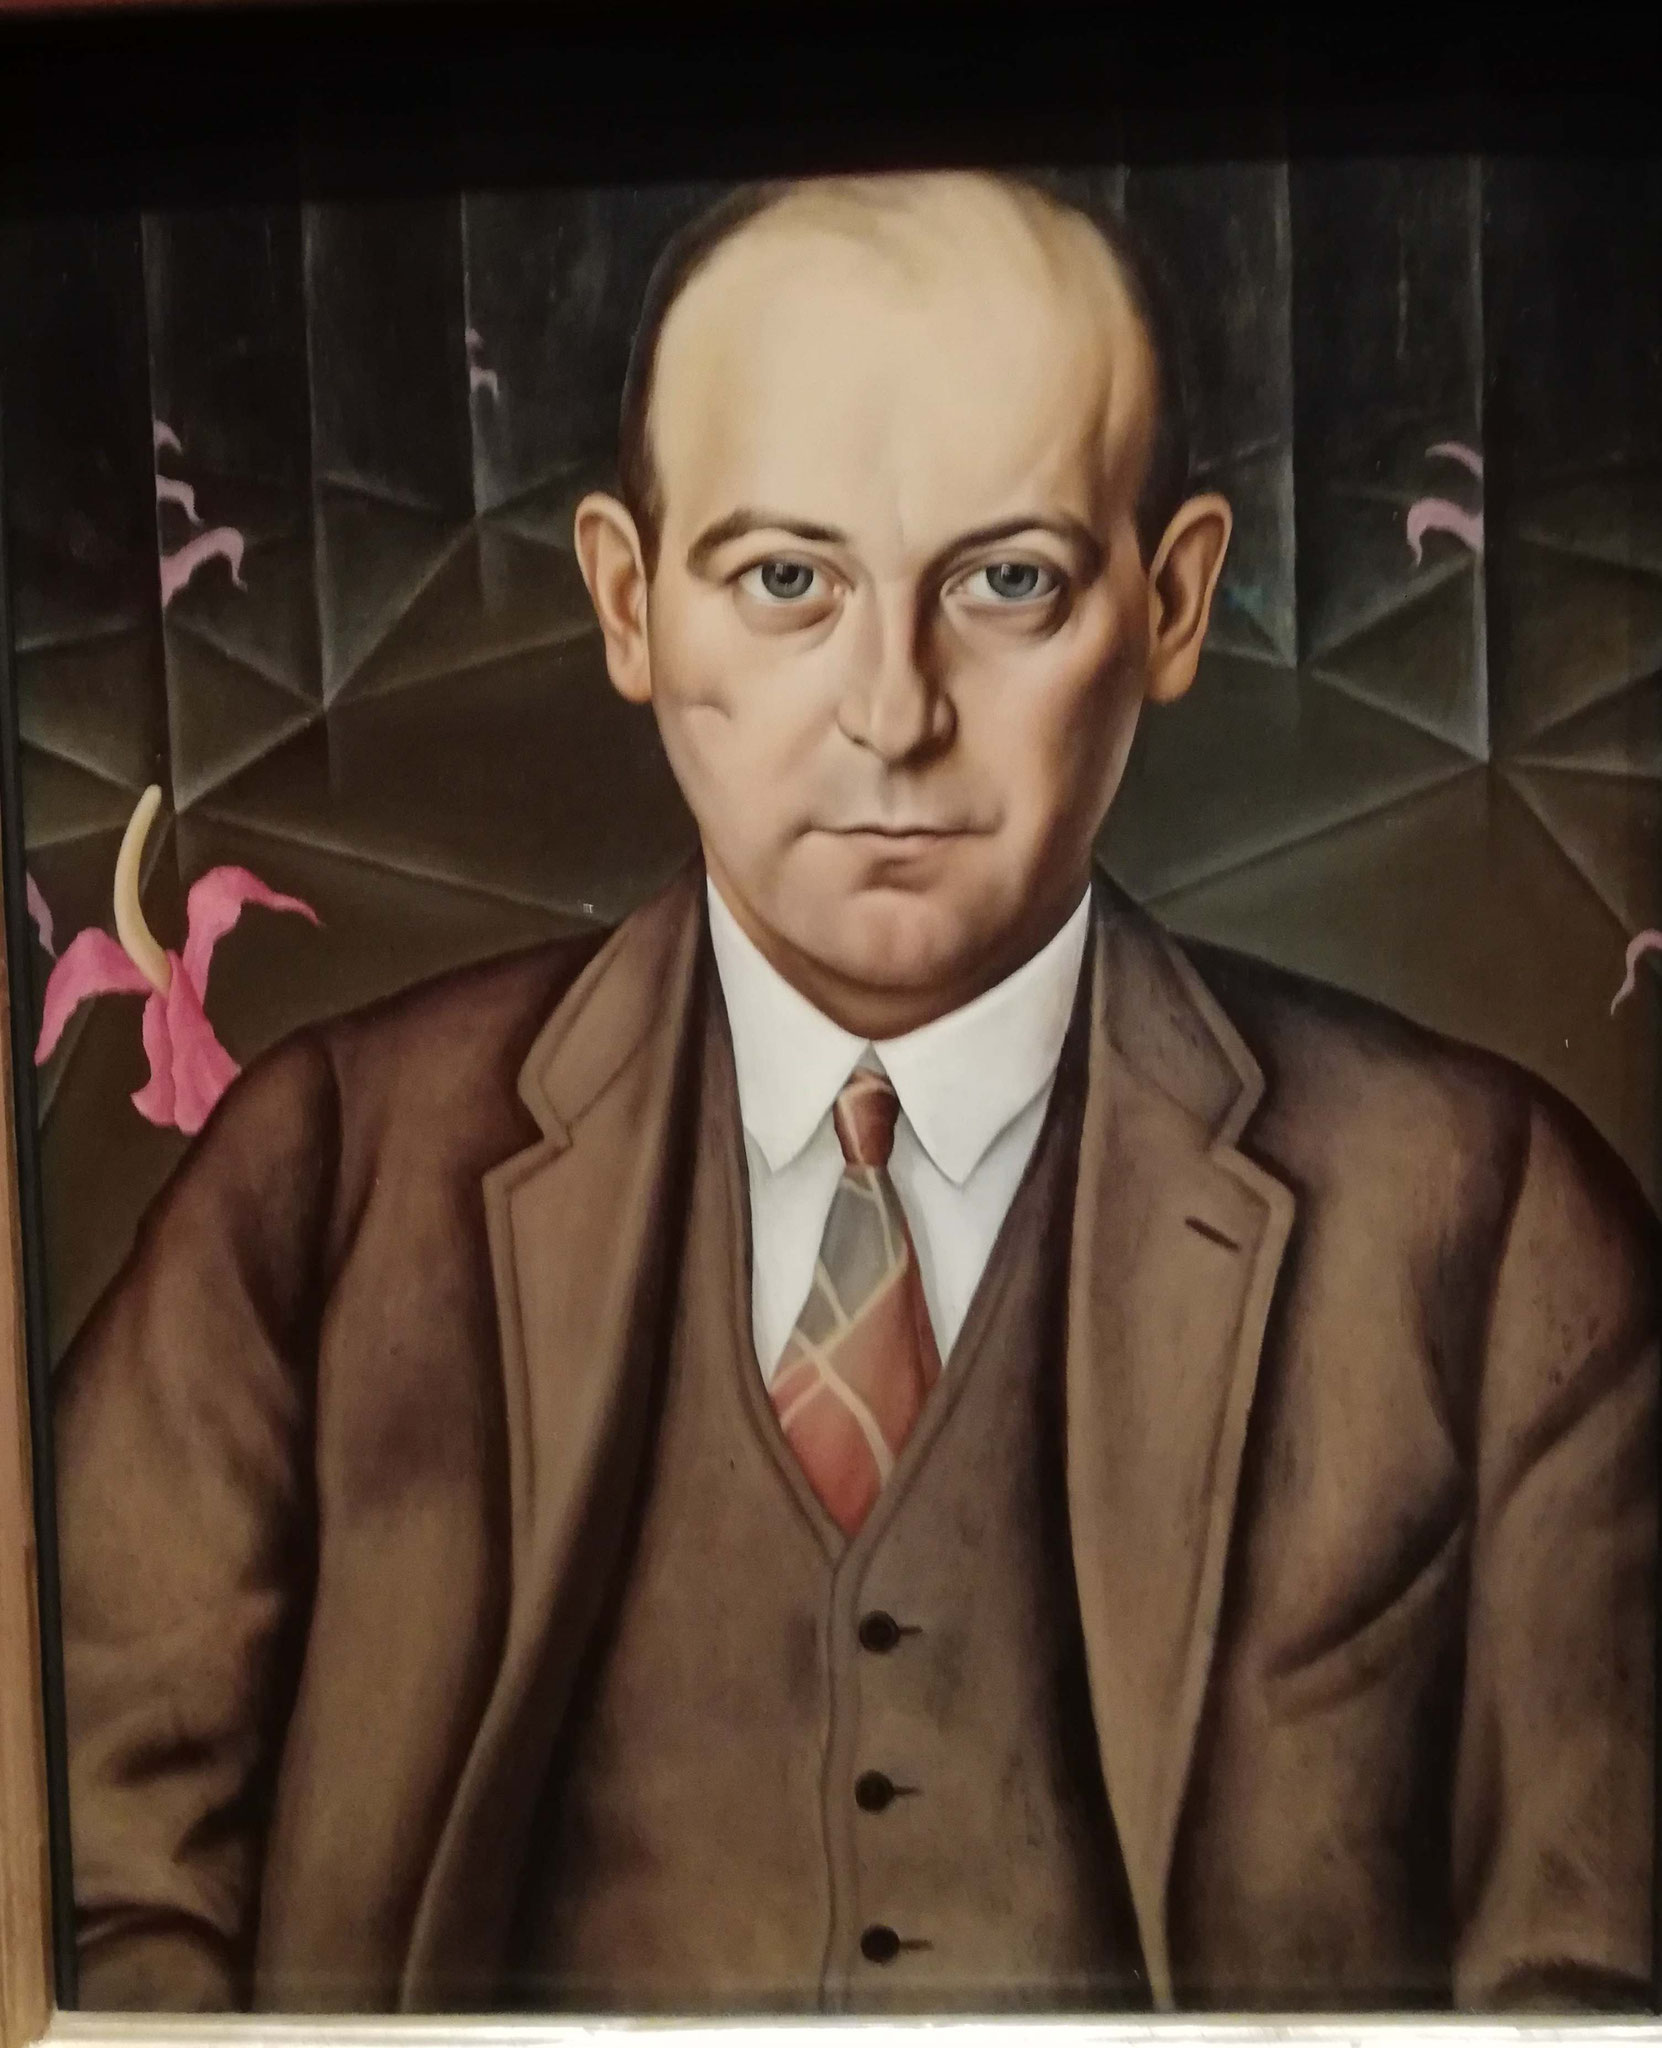 Christian Schad, Porträt des Schriftstellers Ludwig Bäumer, 1927, Berlinische Galerie